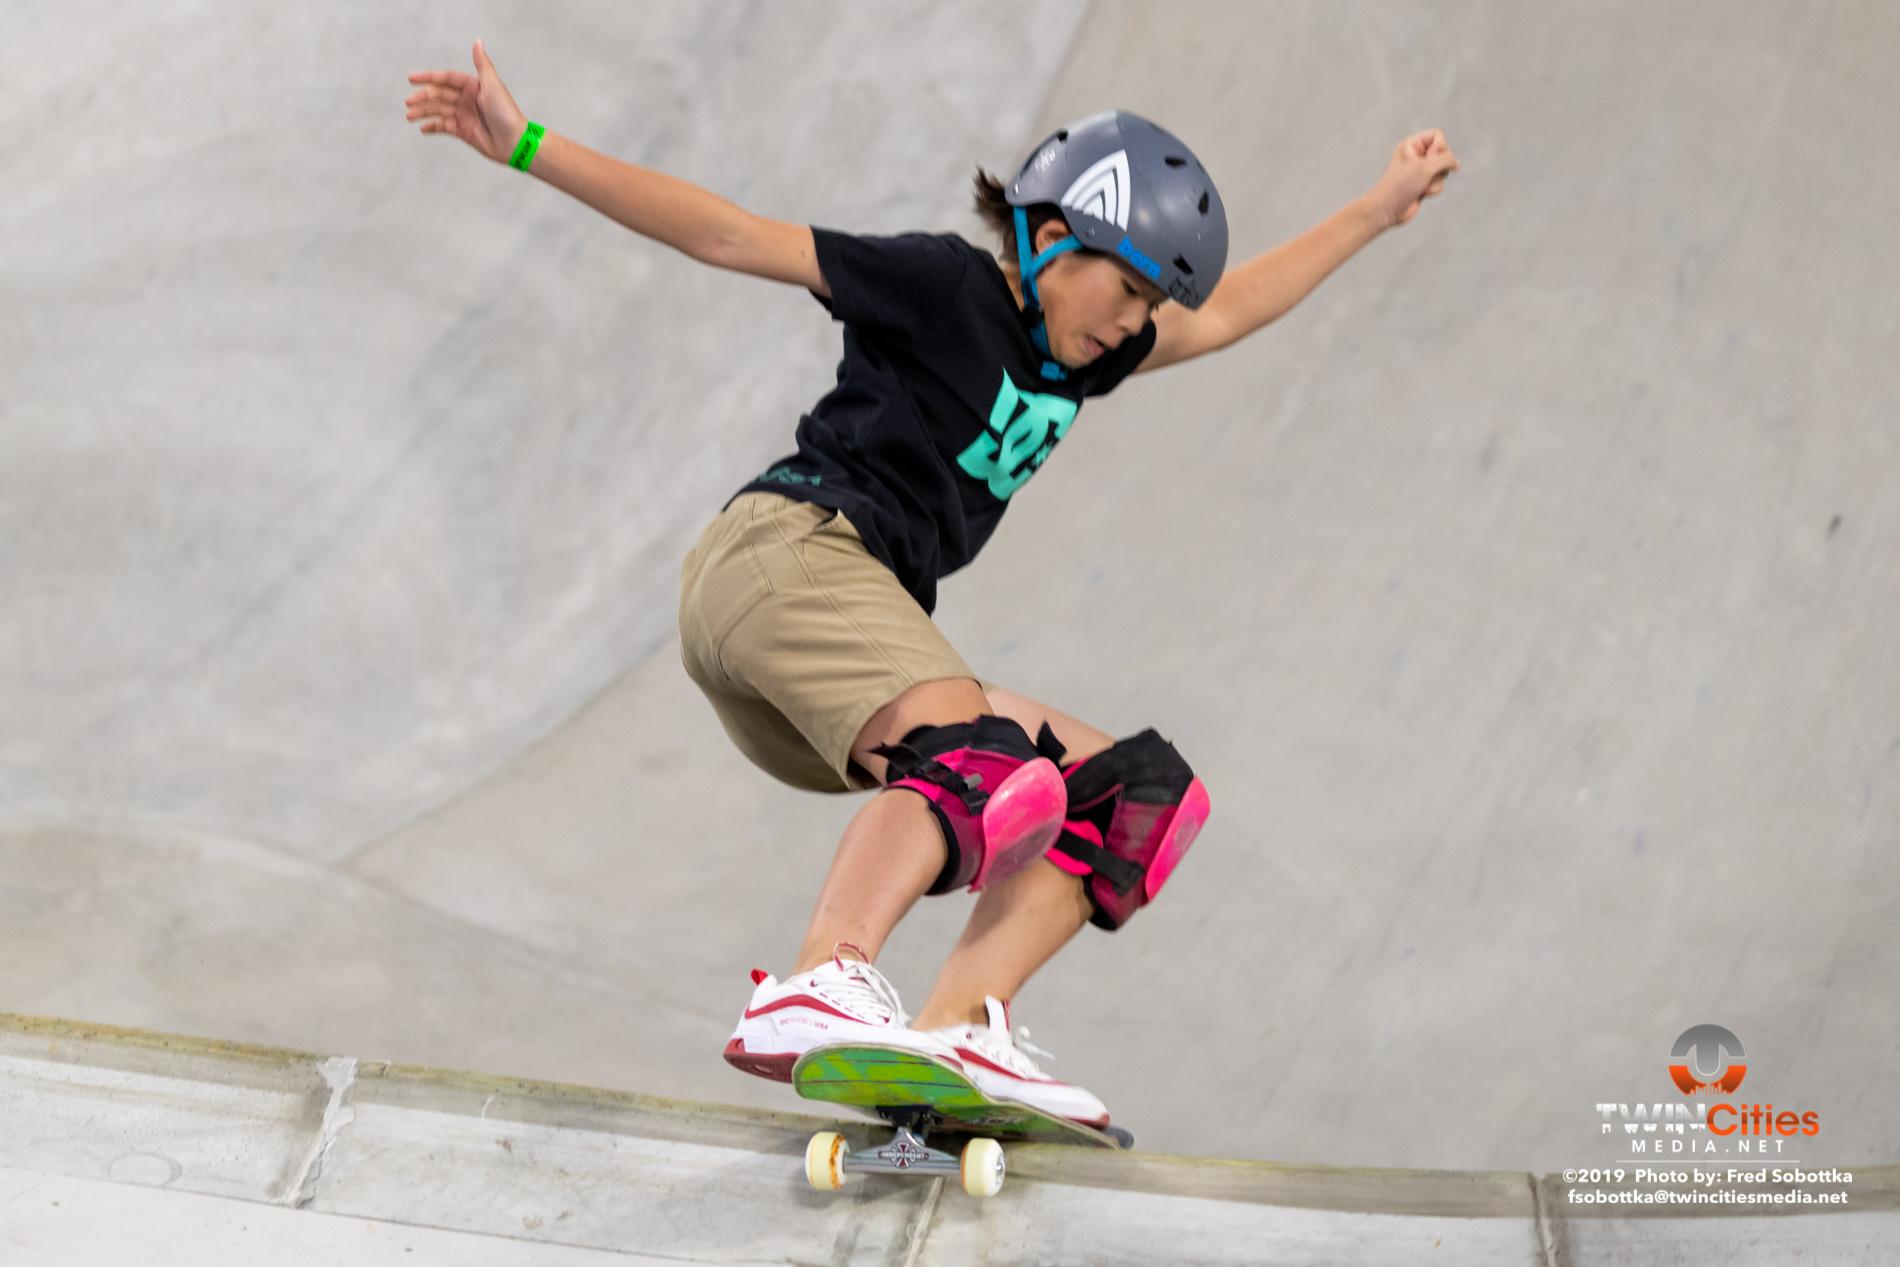 Womens-Skateboard-Park-15